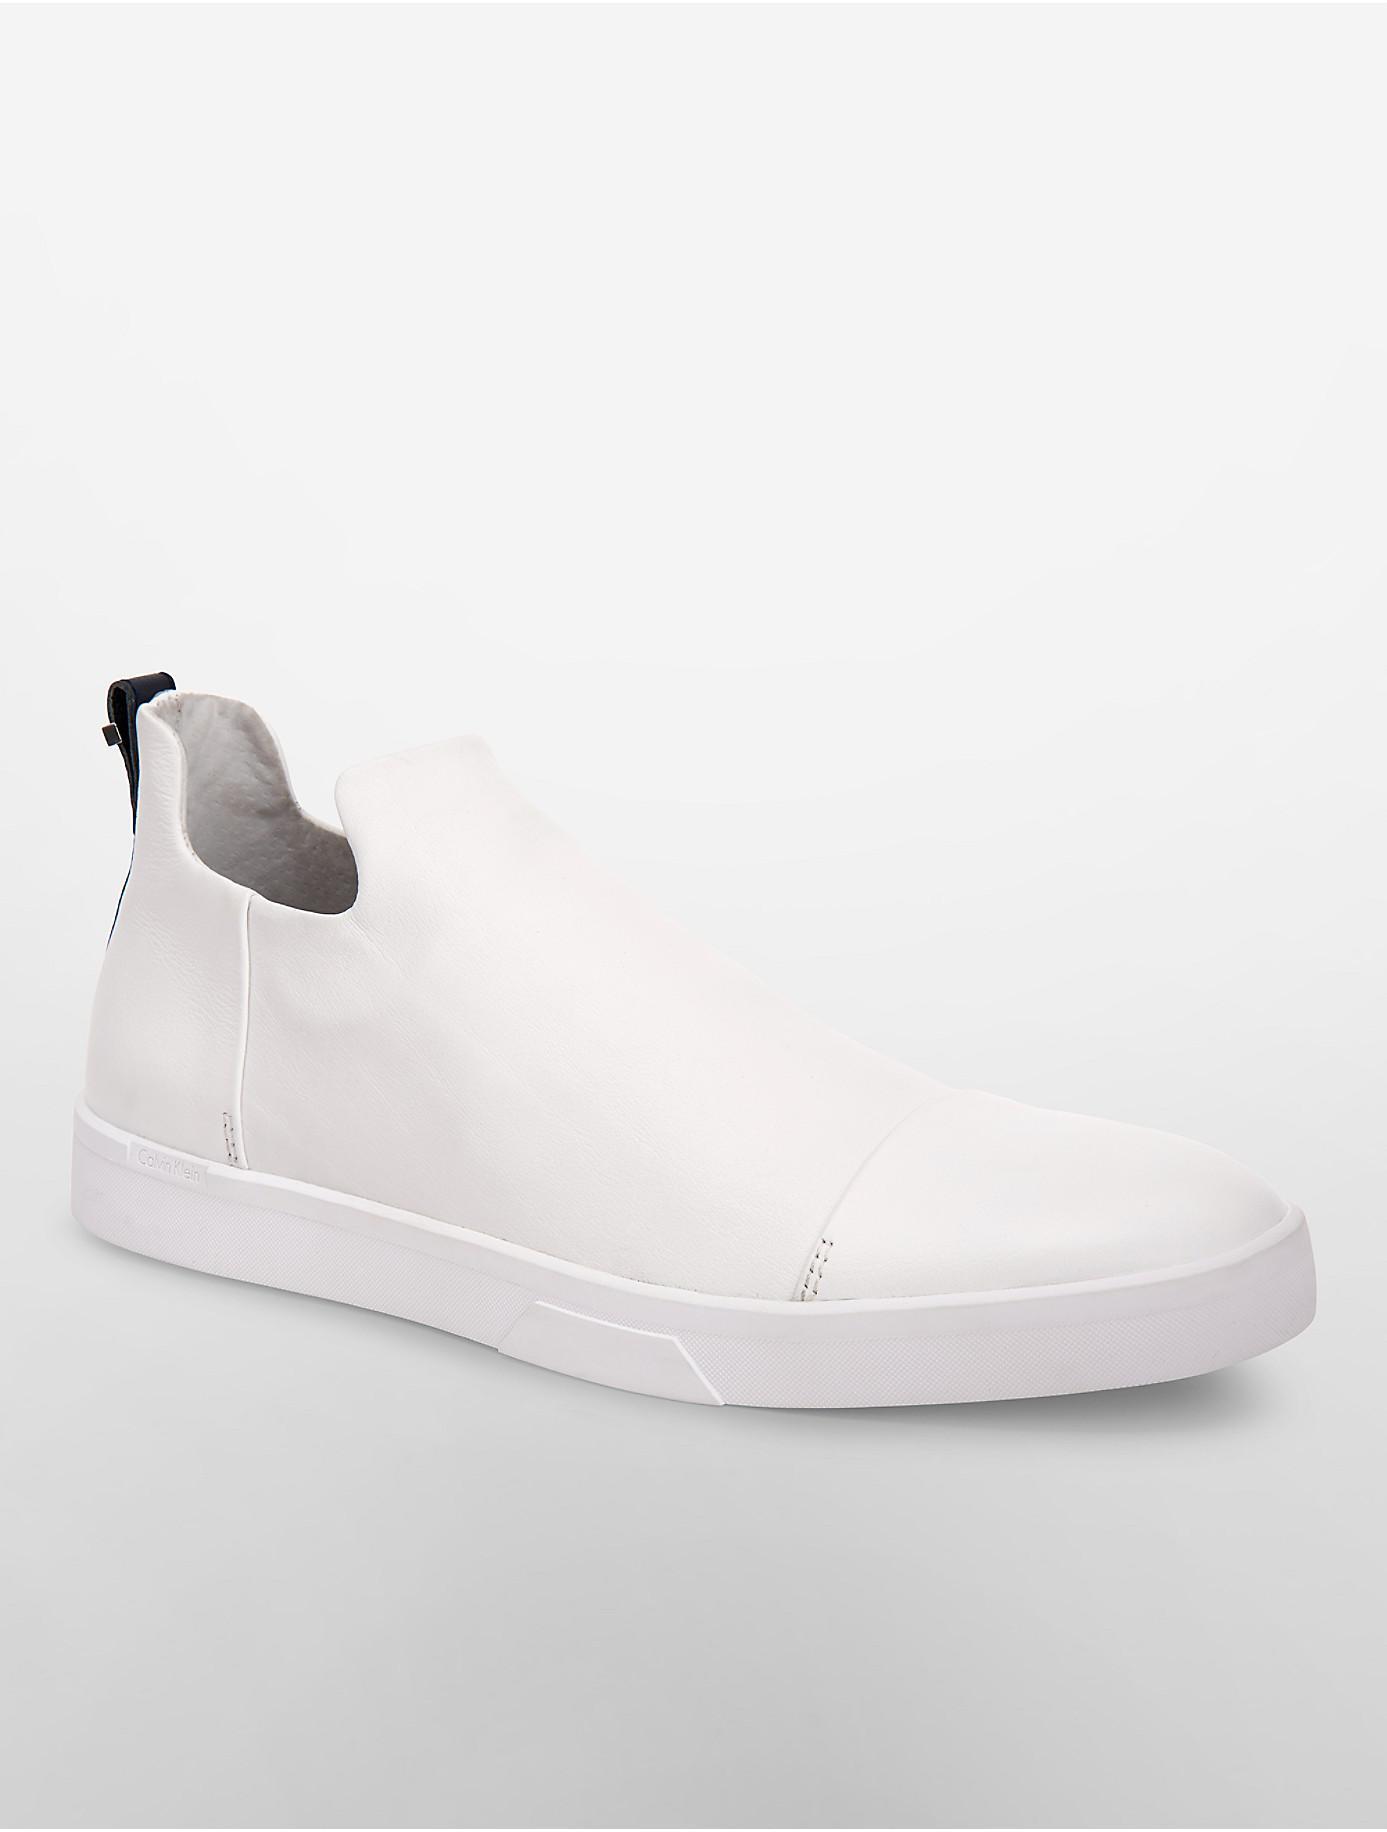 slip-on low-top sneakers - Black CALVIN KLEIN 205W39NYC dlzZEj